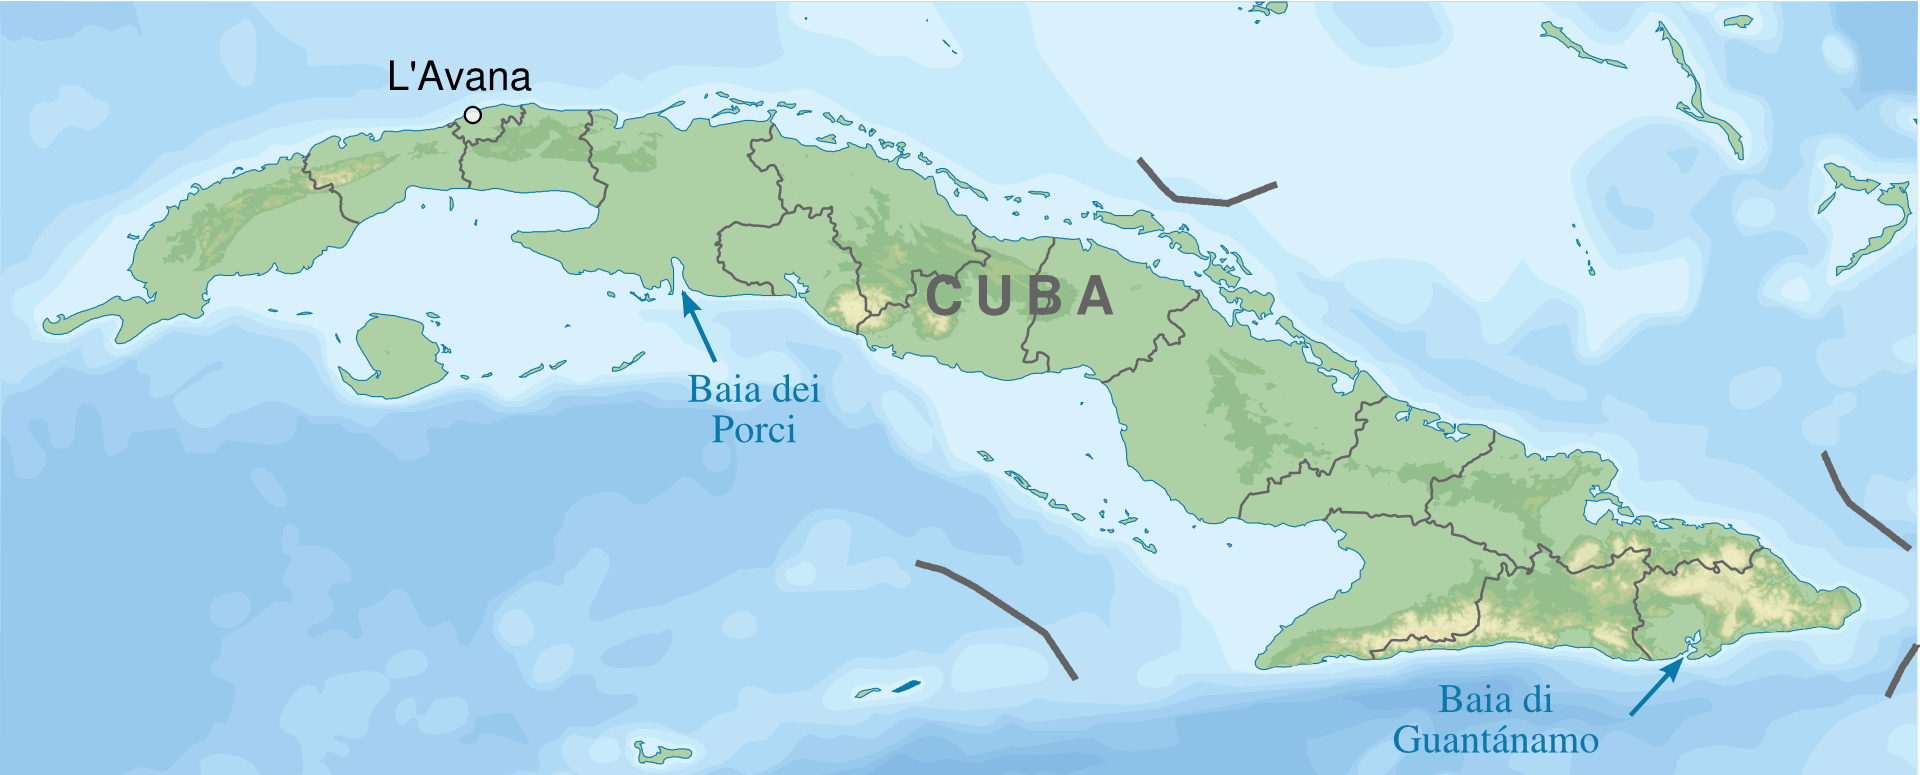 Karte Kuba.Karte Kuba Casa Particular Verzeichnis